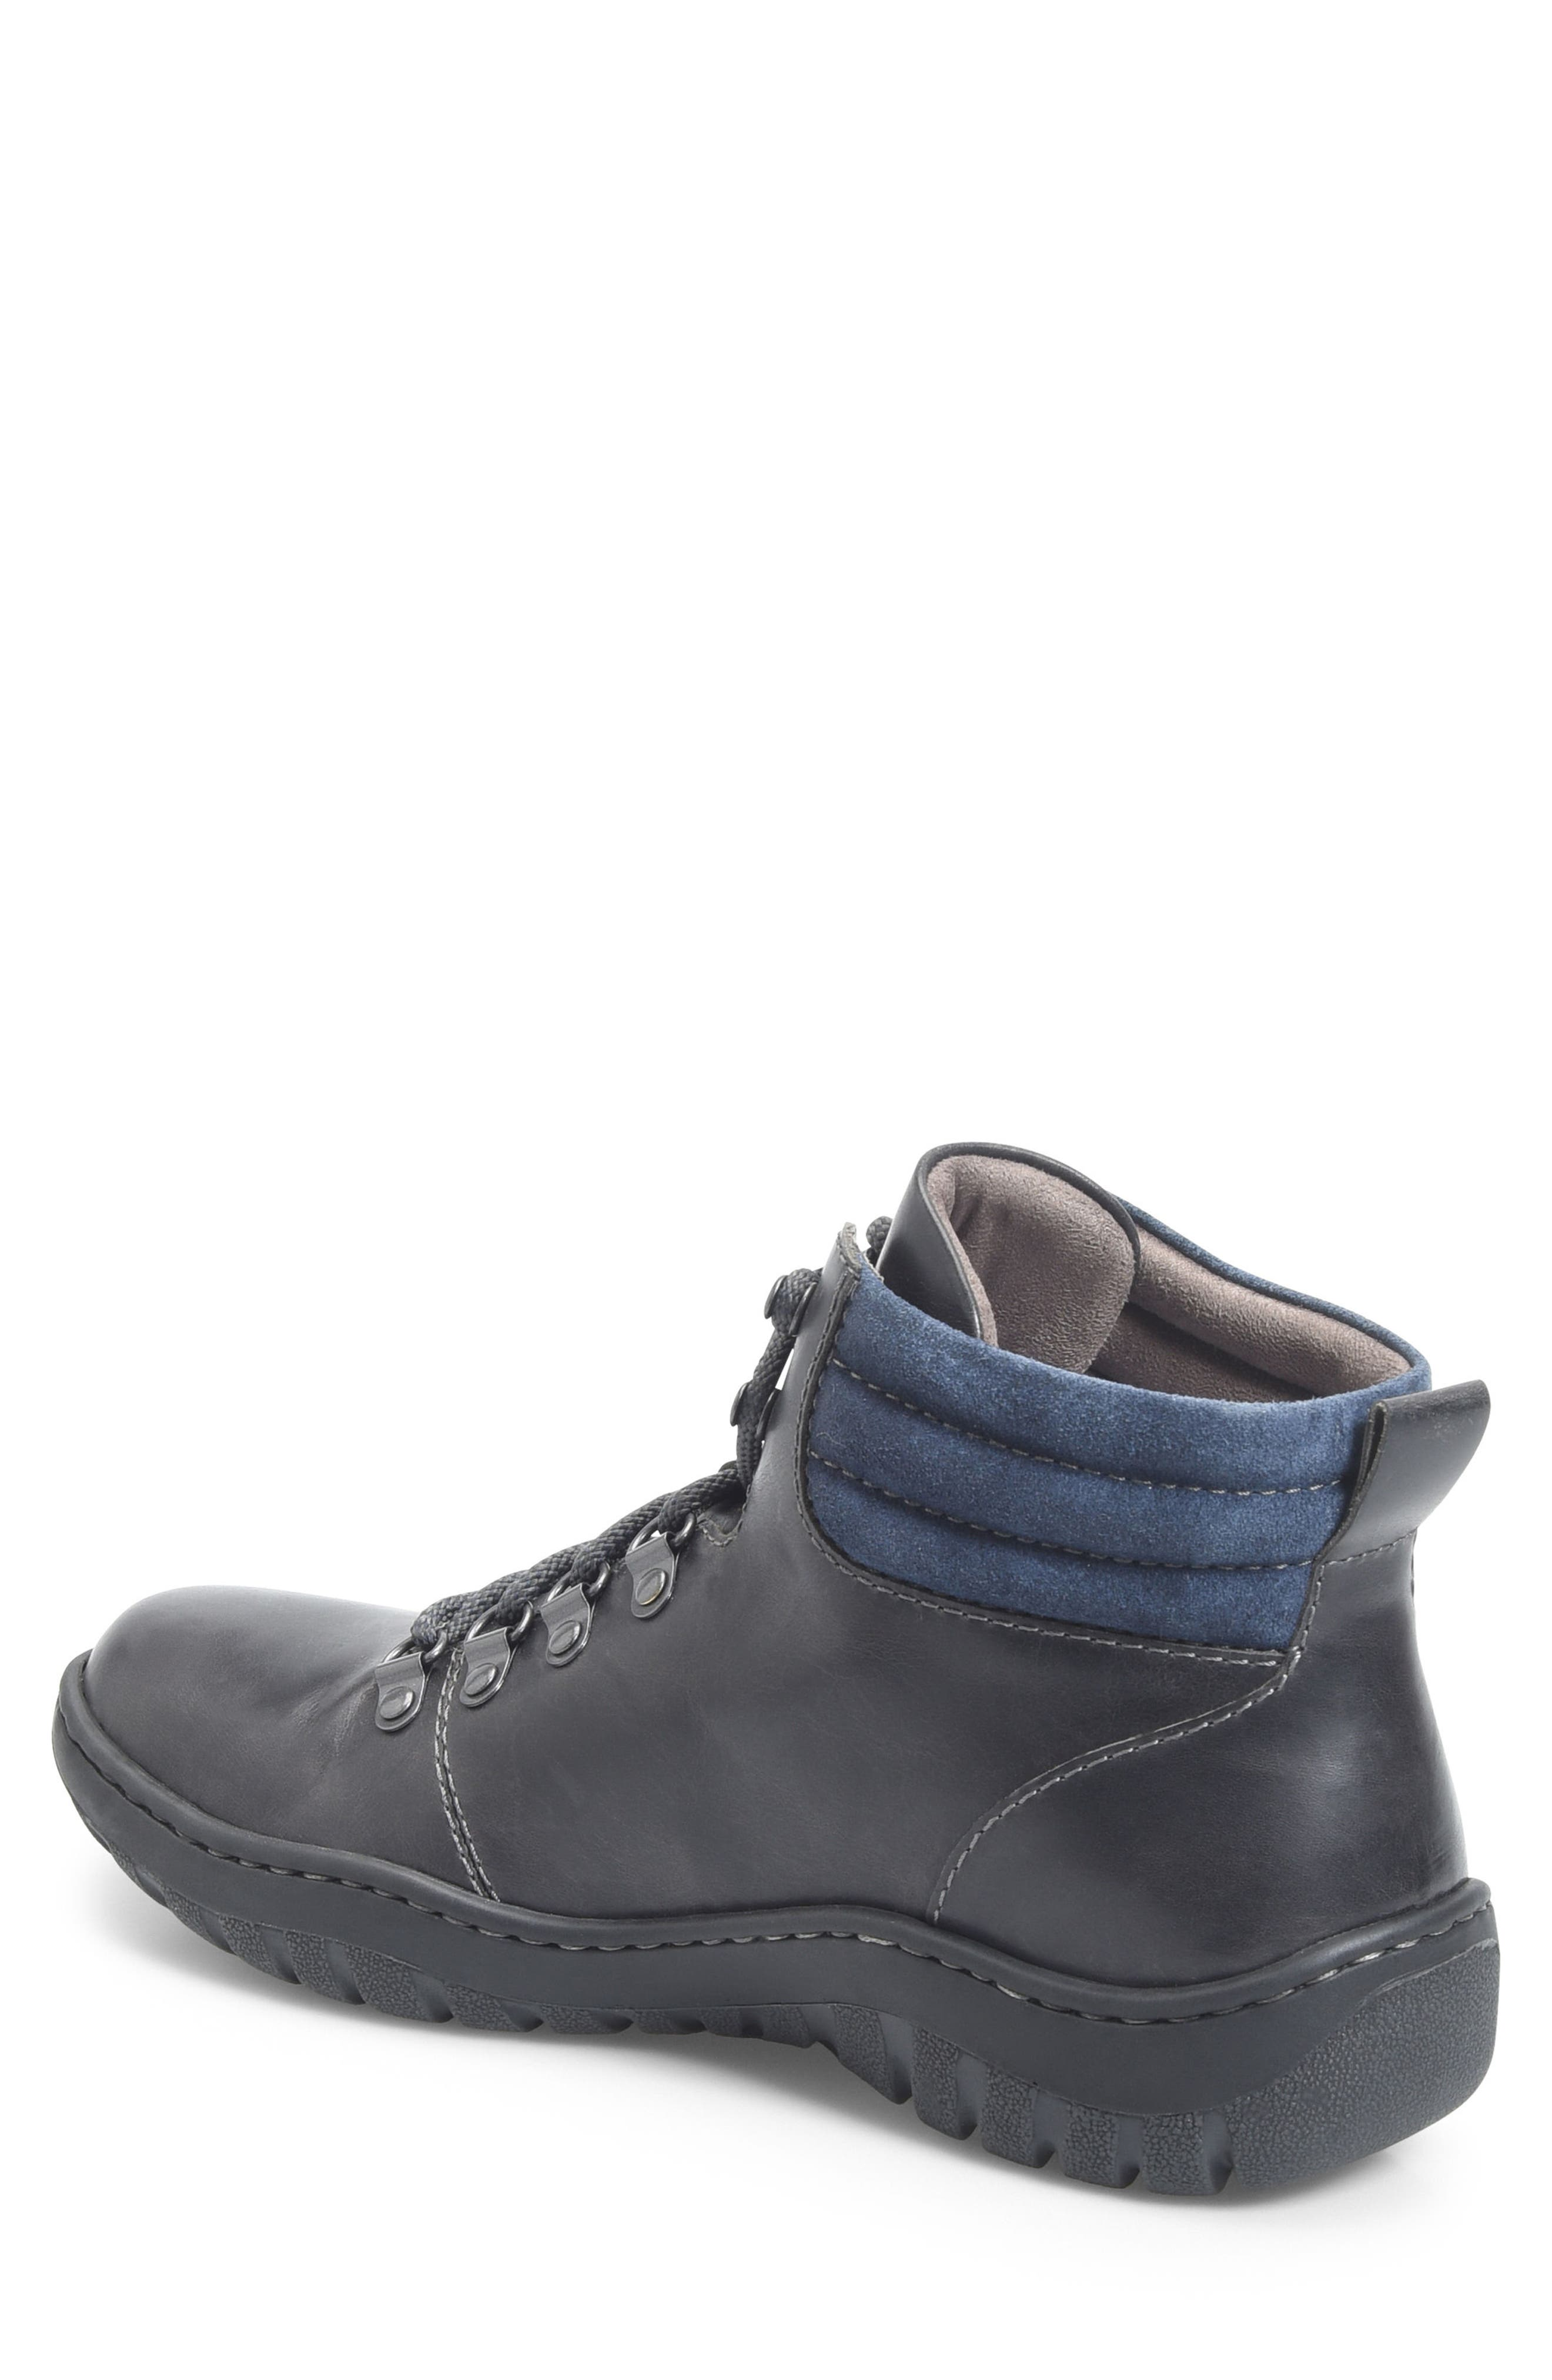 Dutchman Plain Toe Boot,                             Alternate thumbnail 2, color,                             DARK GREY/ BLUE